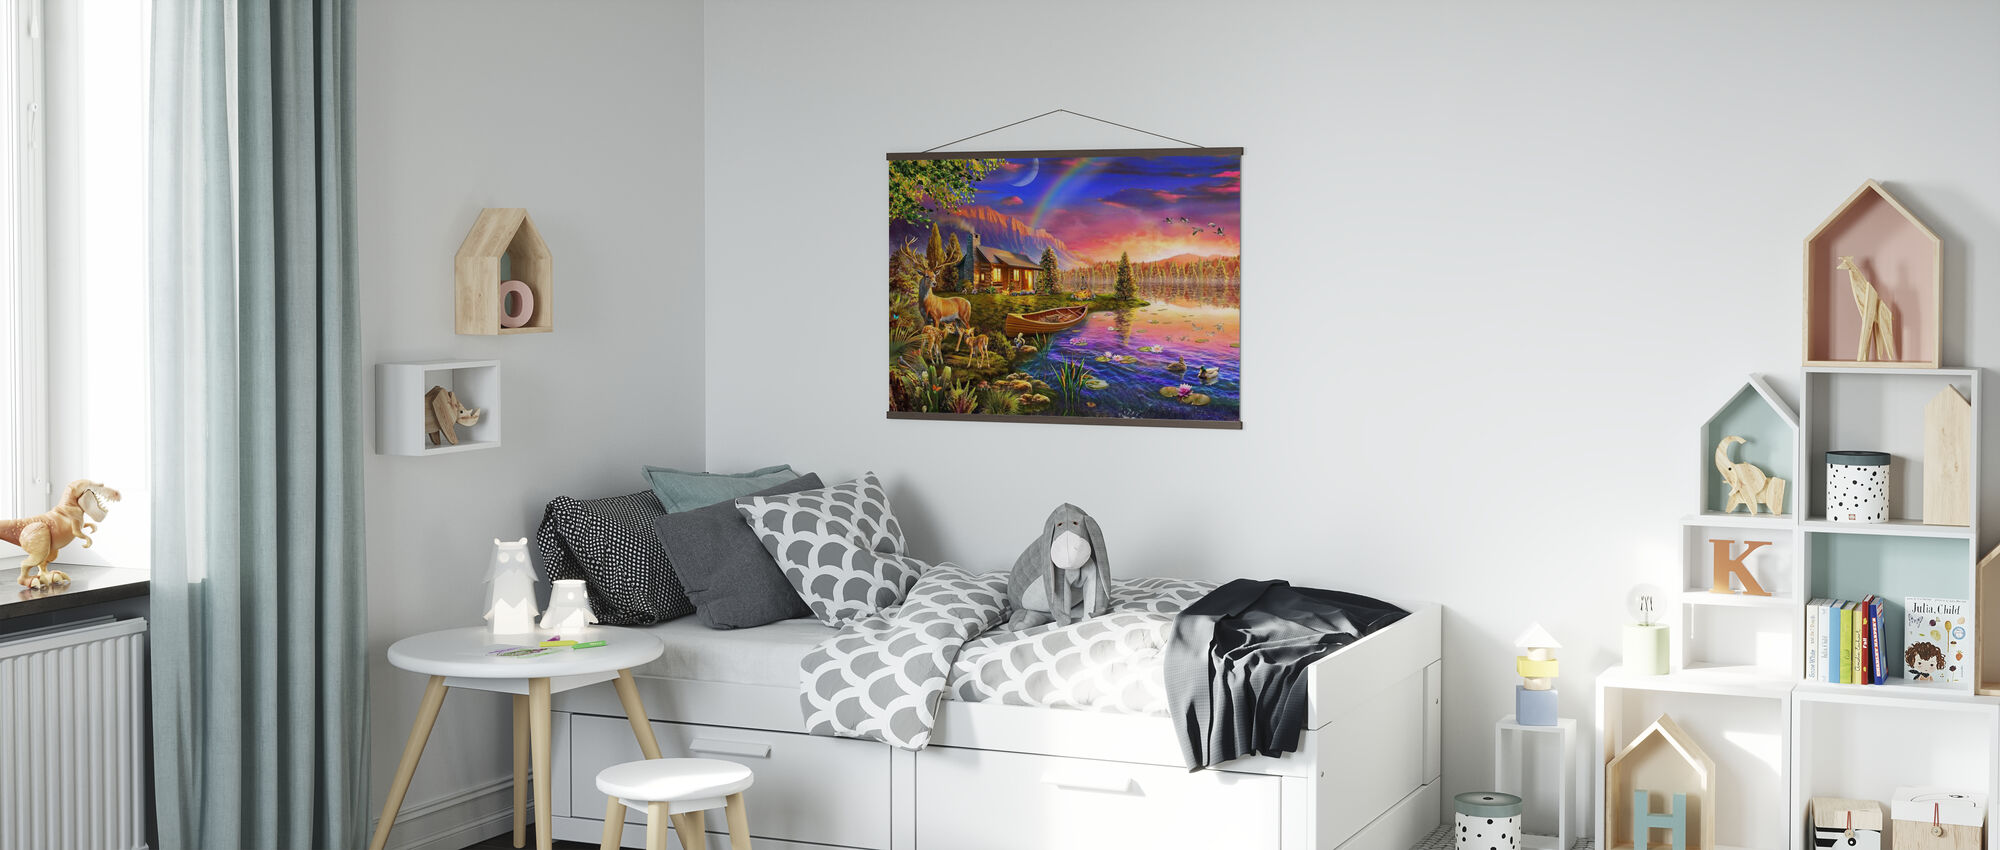 Lakeside Cabin - Poster - Kids Room